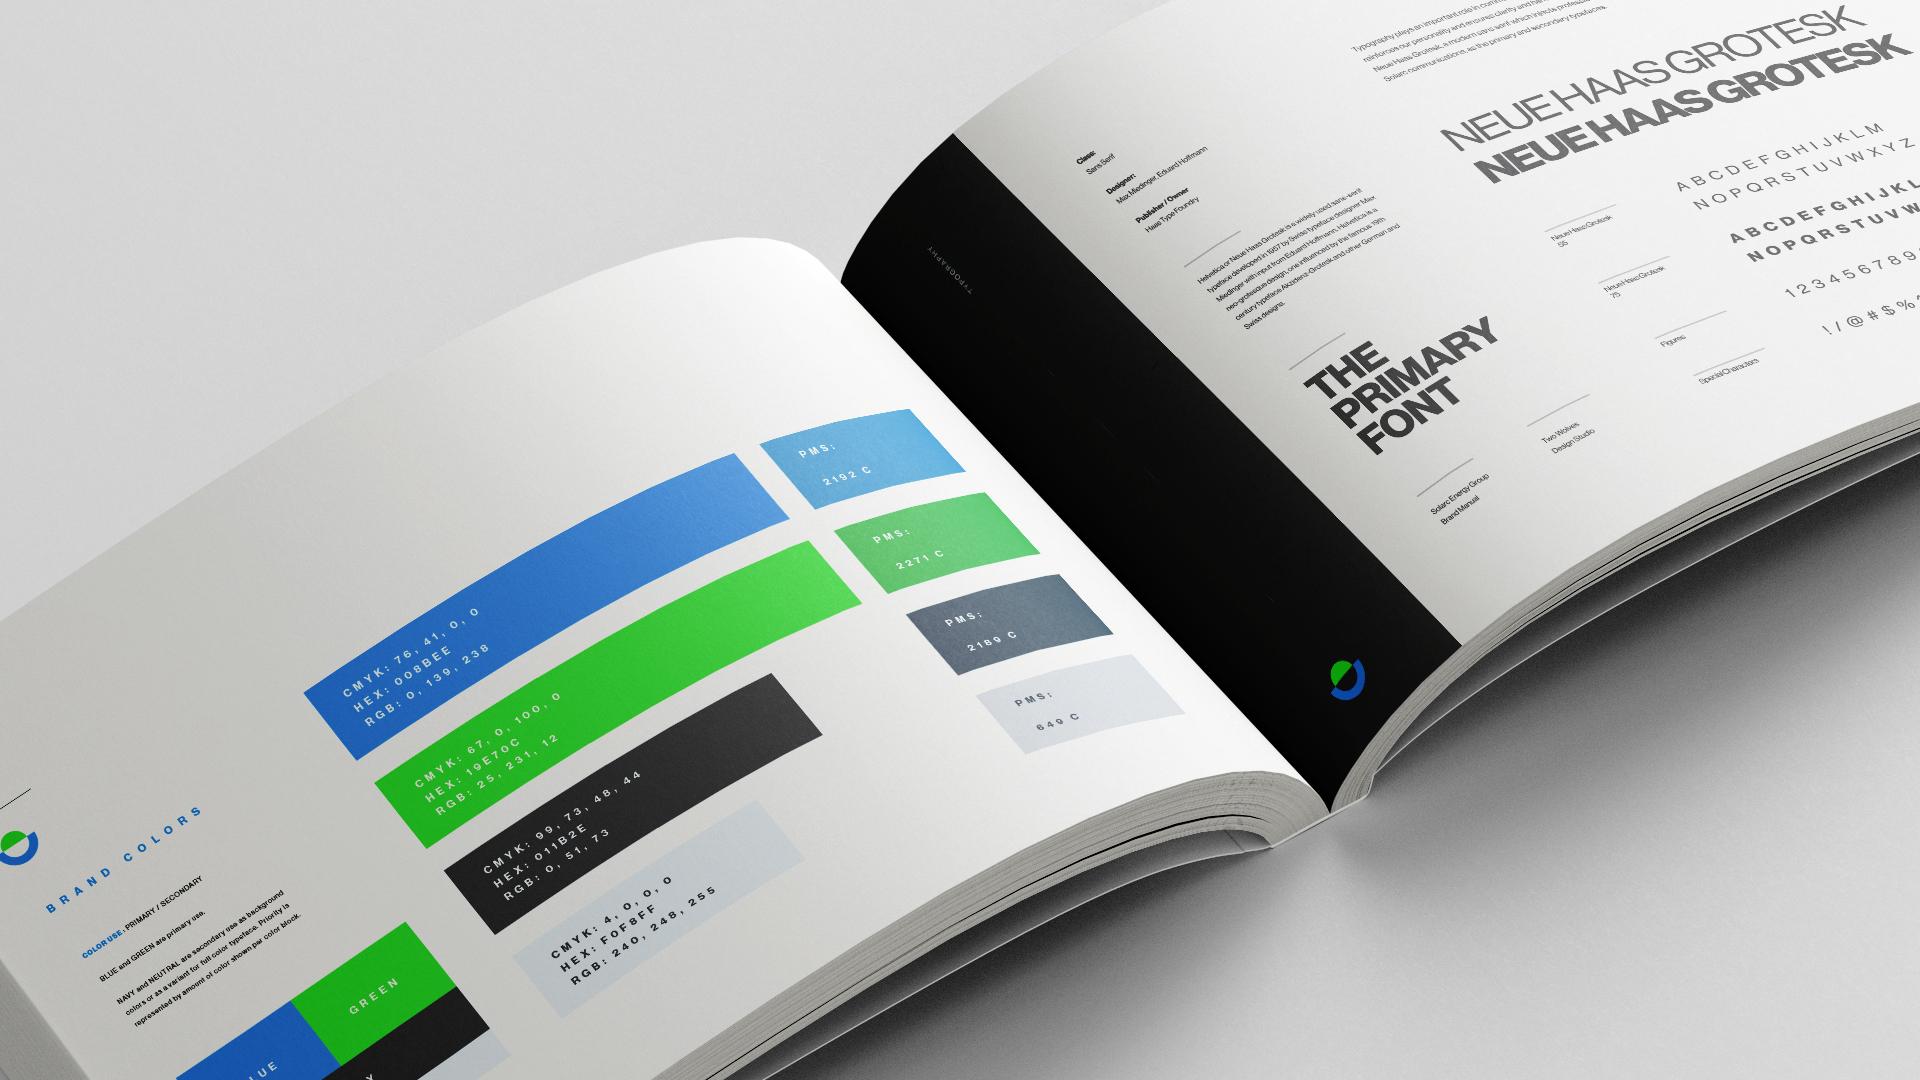 Solarc brand book